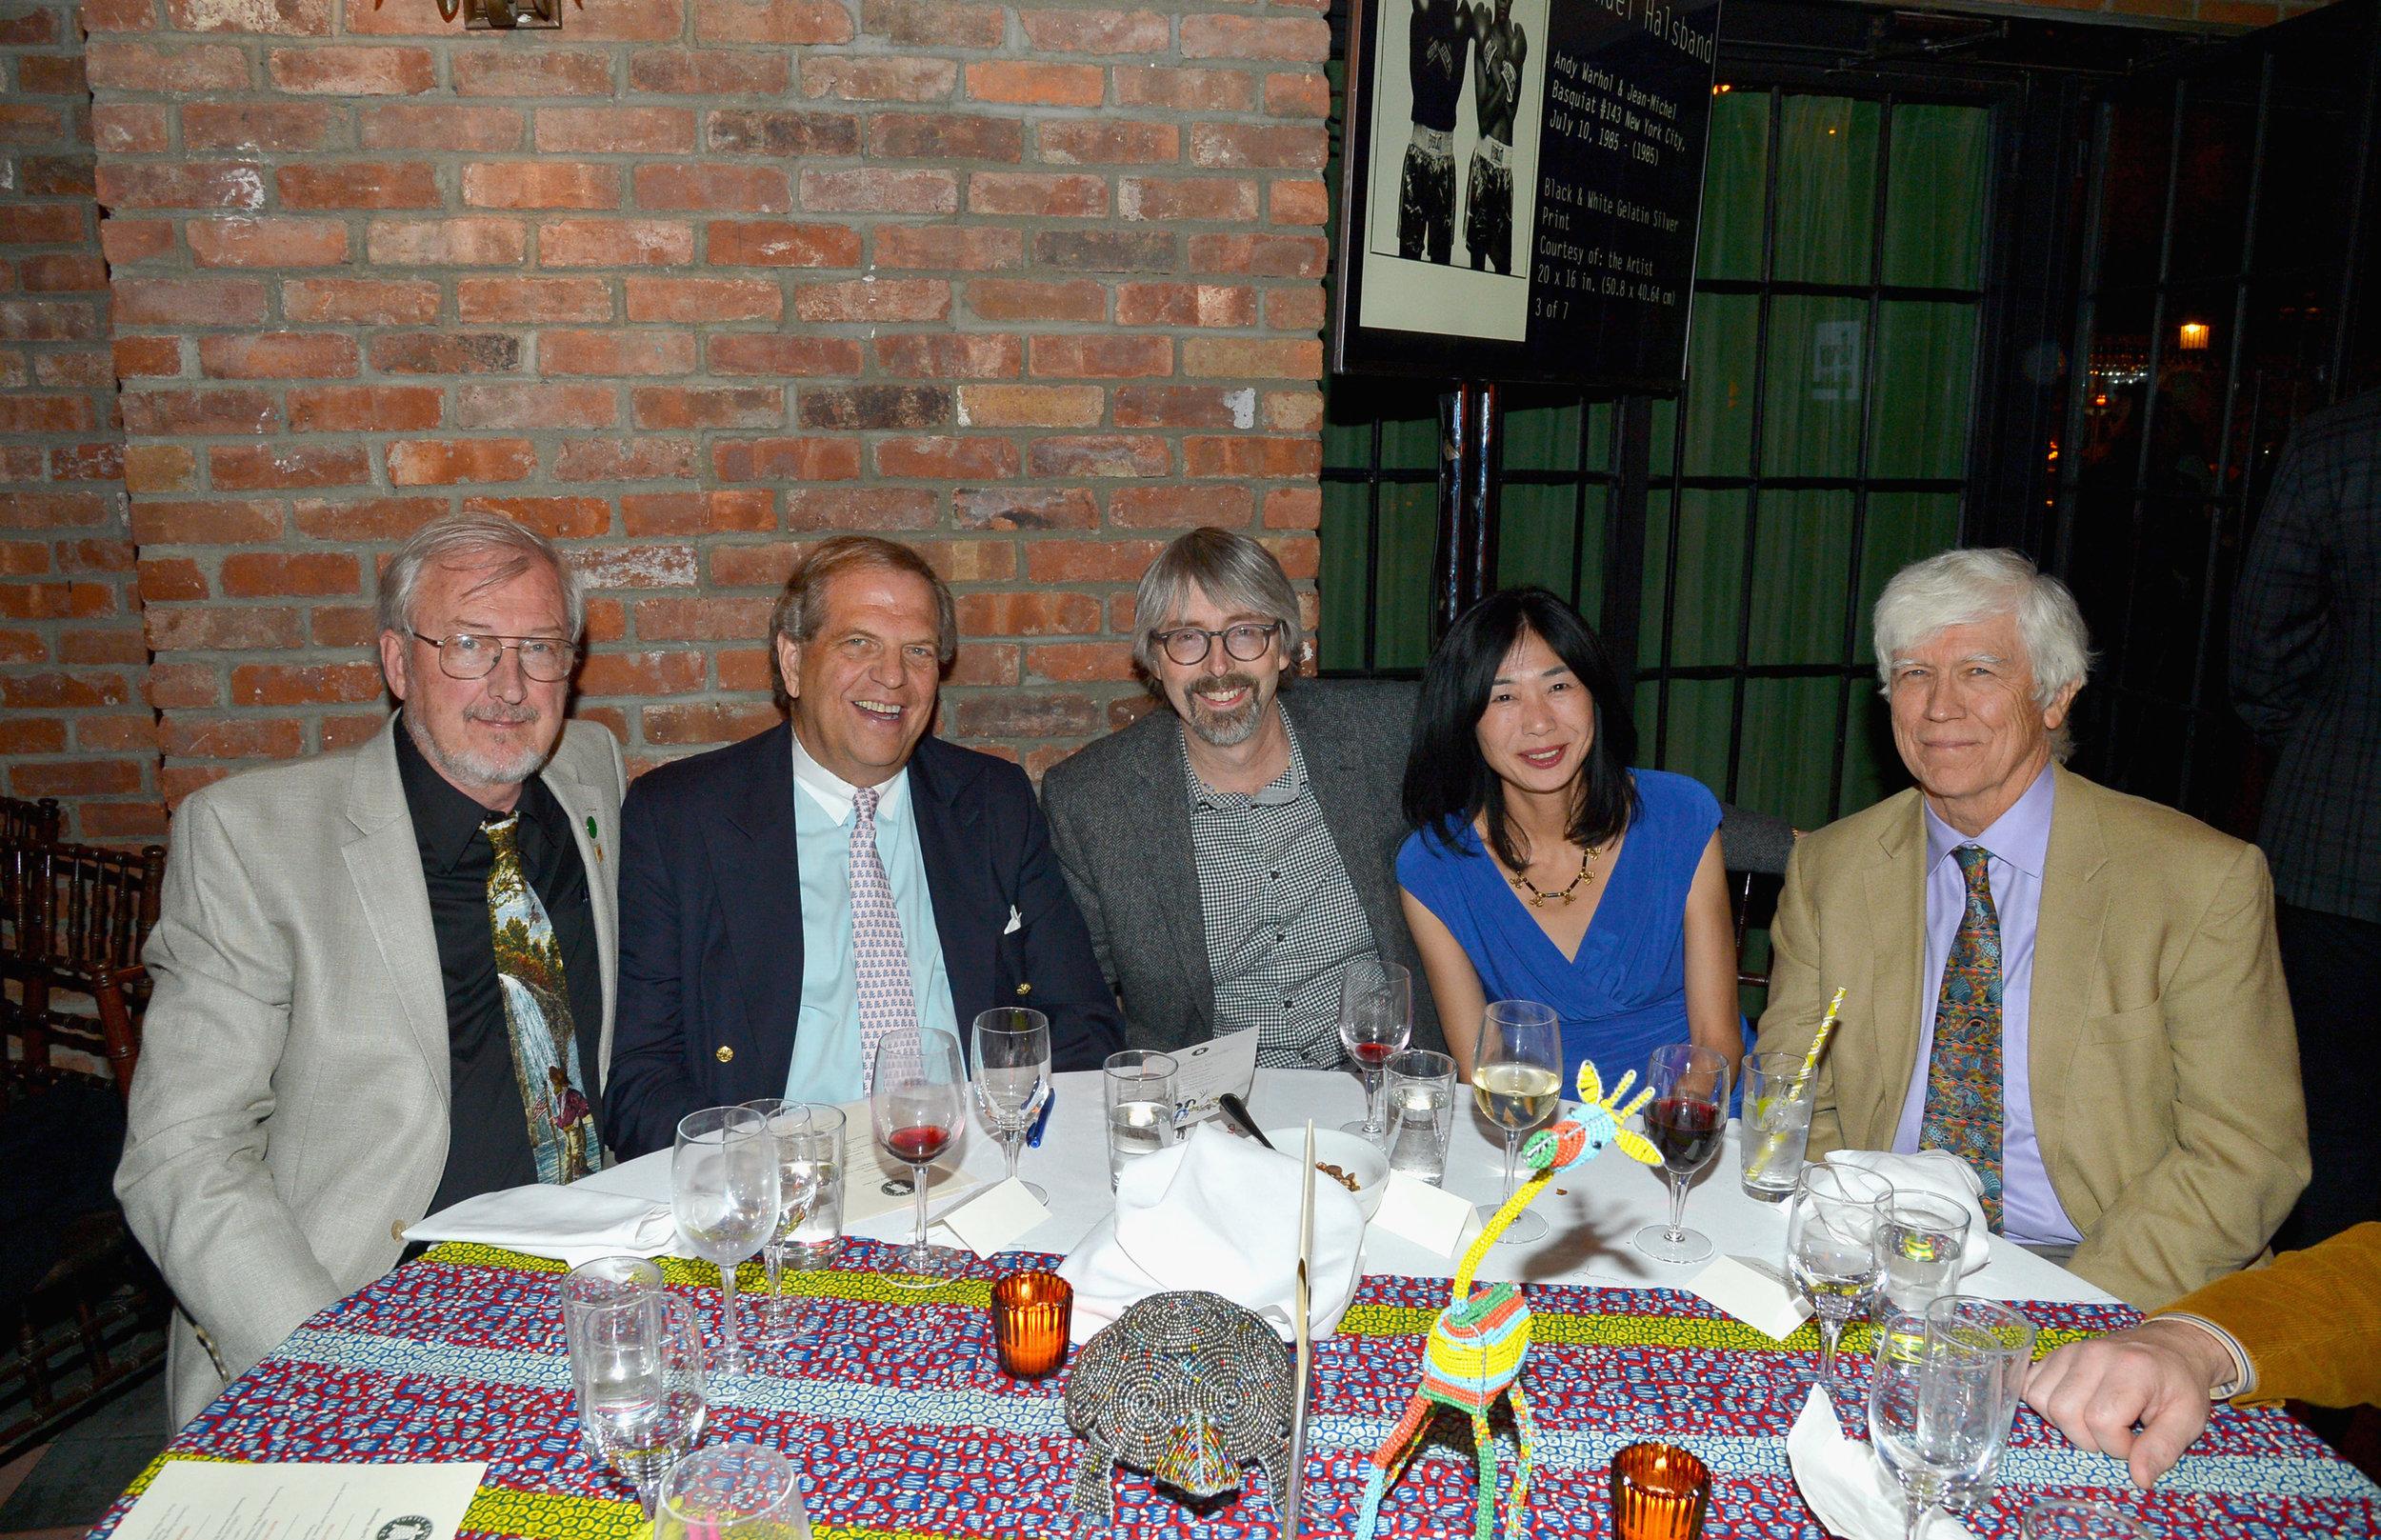 Anders Rhodin, Stuart Salenger George Meyer, Hiromi Tada, and Russell Mittermeier